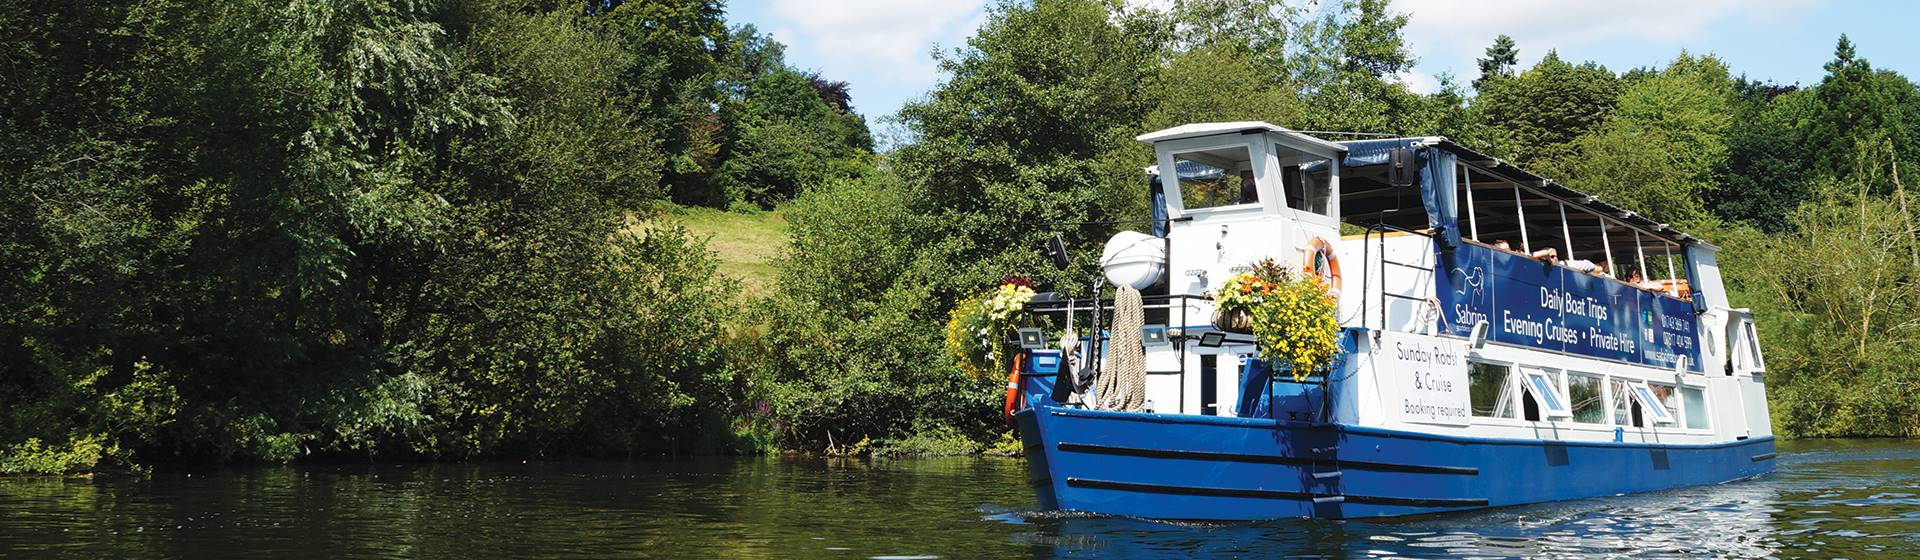 Shrewsbury & A Cruise on the River